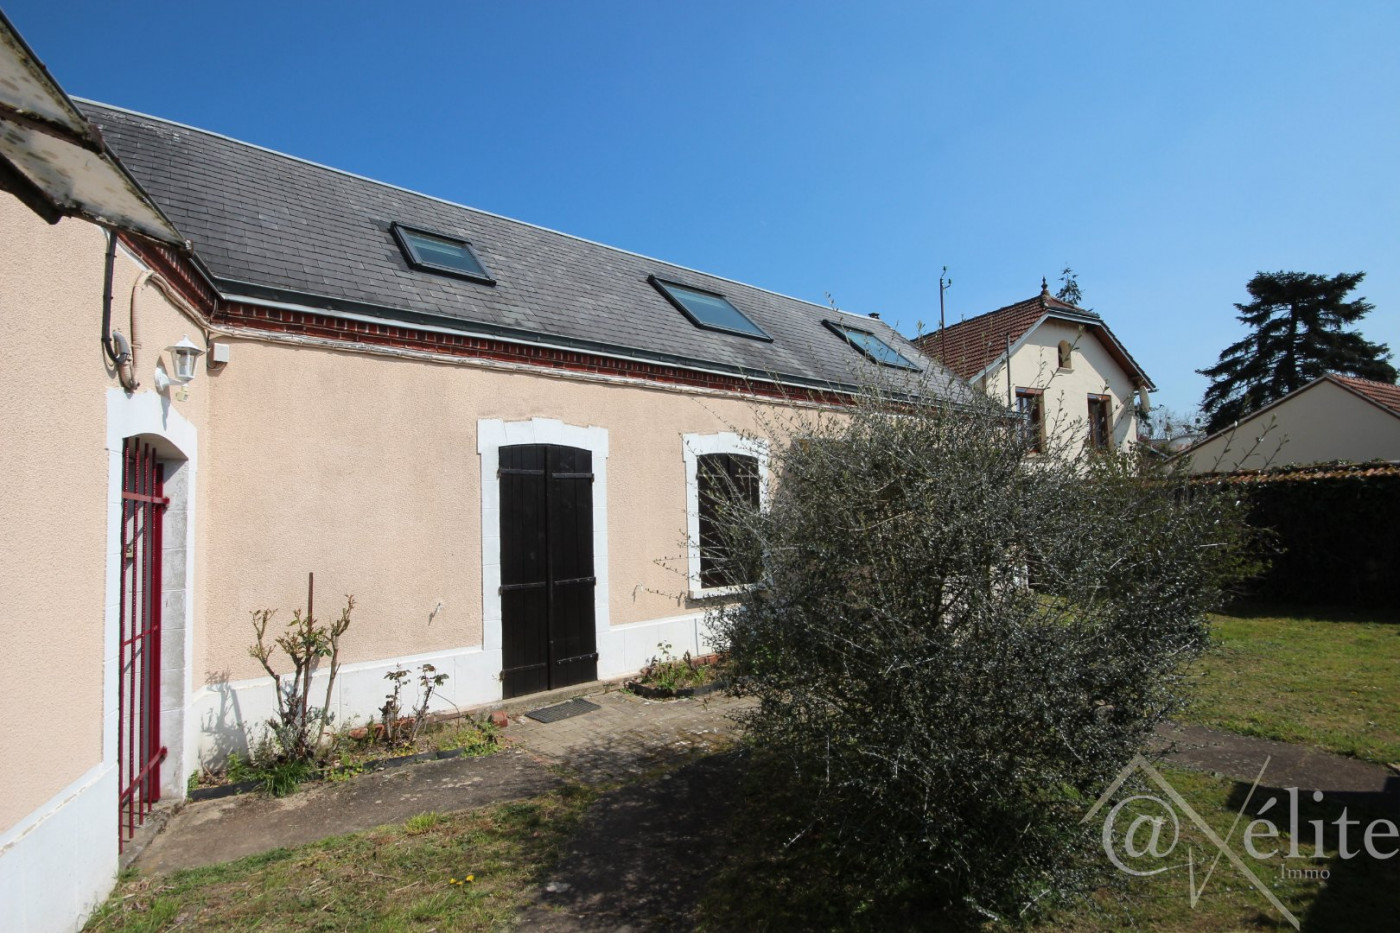 A vendre Chartres 77792796 Axelite sas